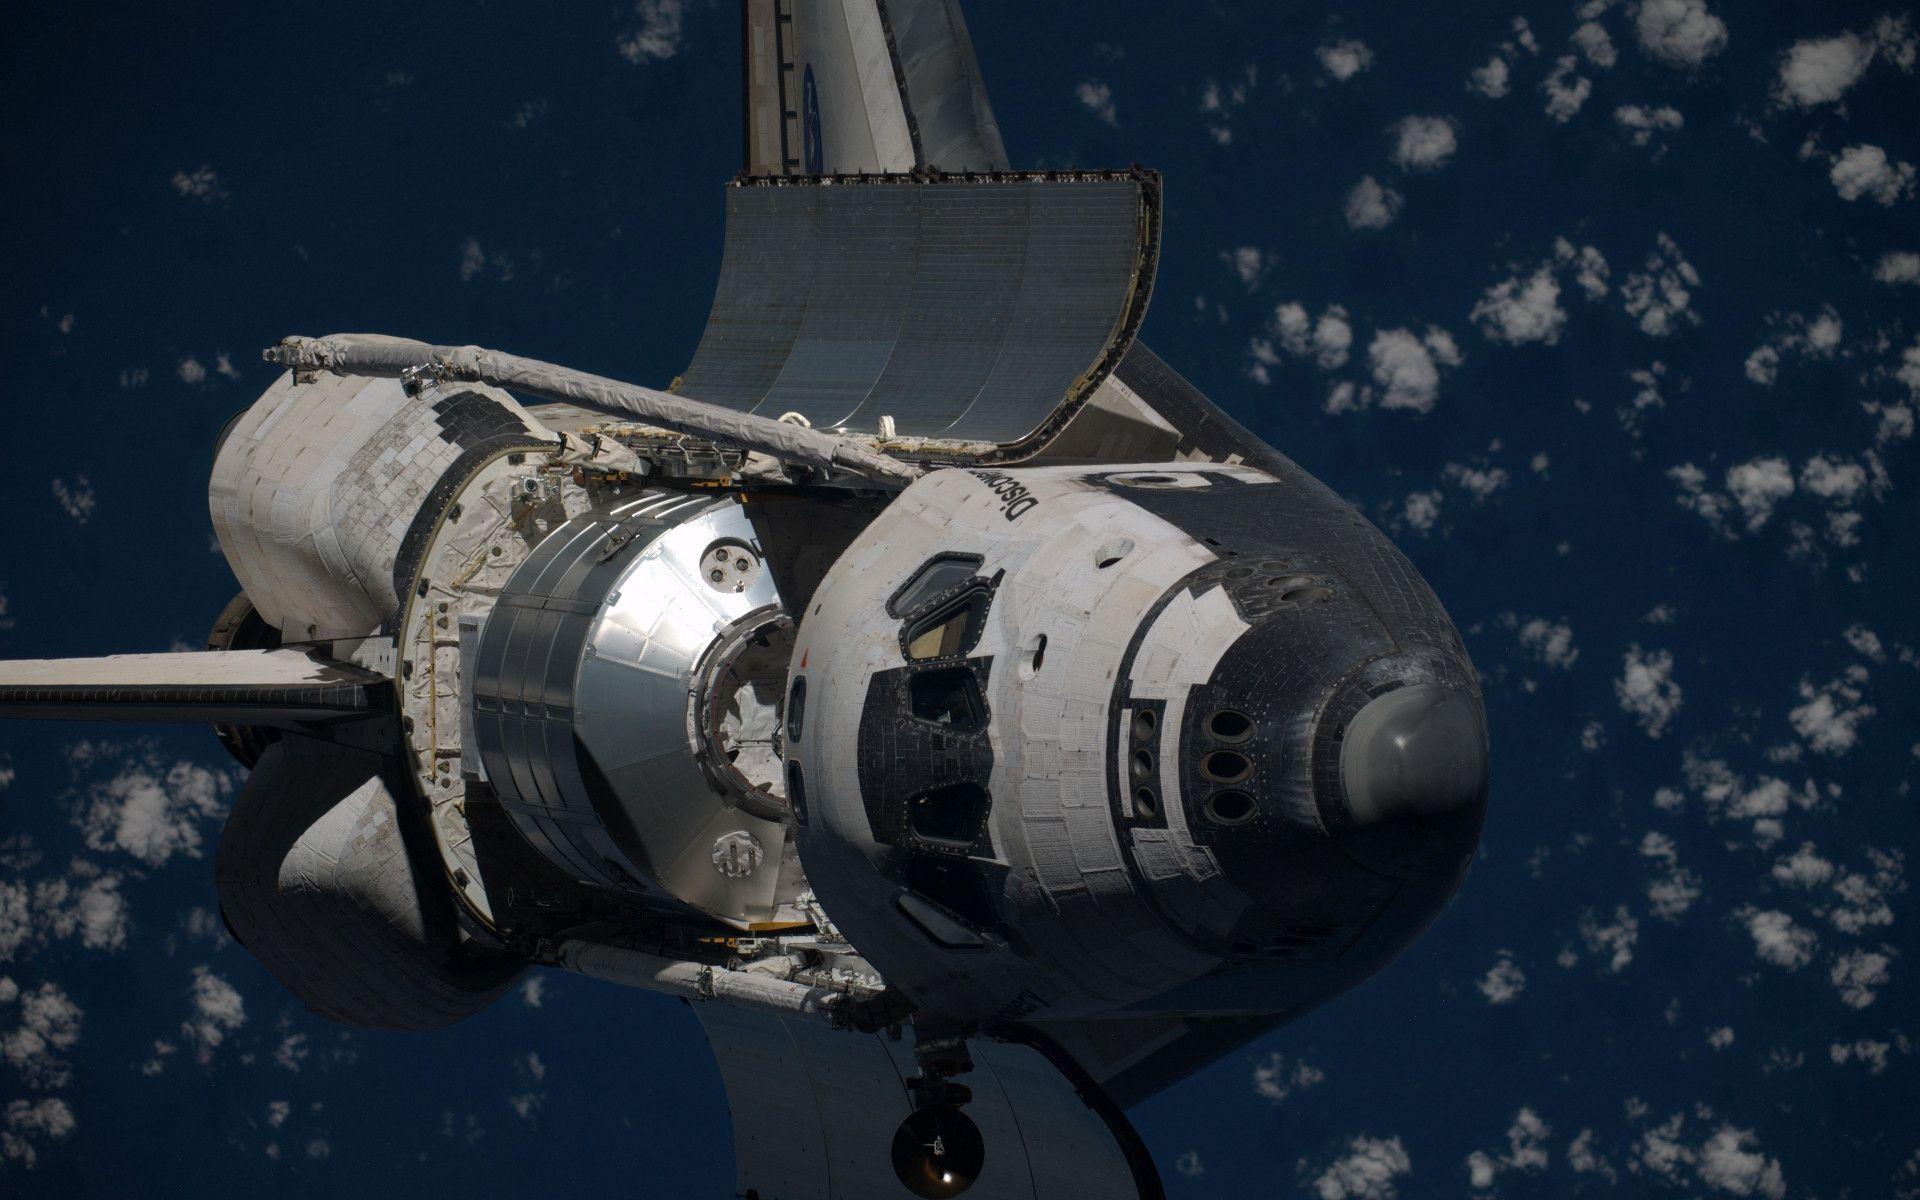 future space shuttle in orbit - photo #48